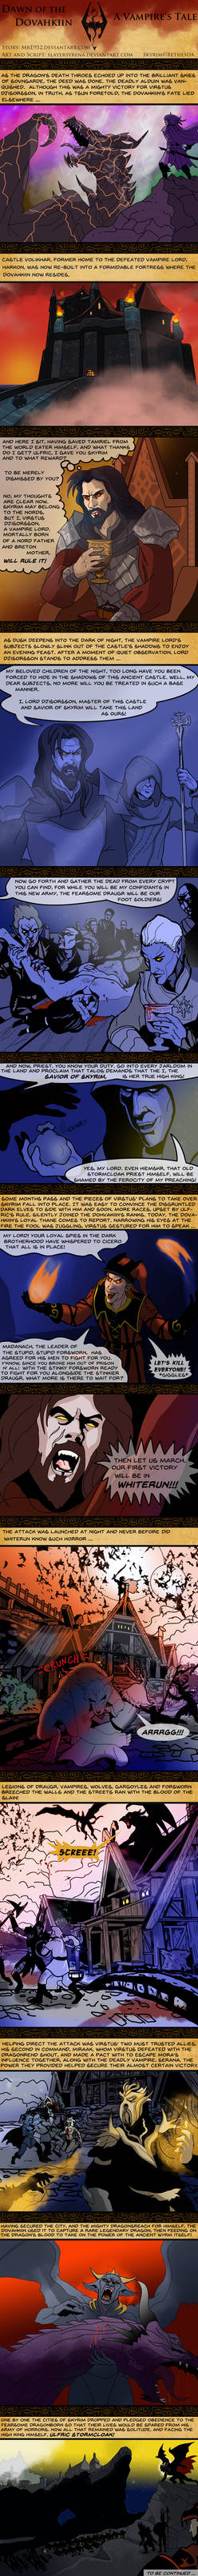 Skyrim: Dawn of the Dovahkiin